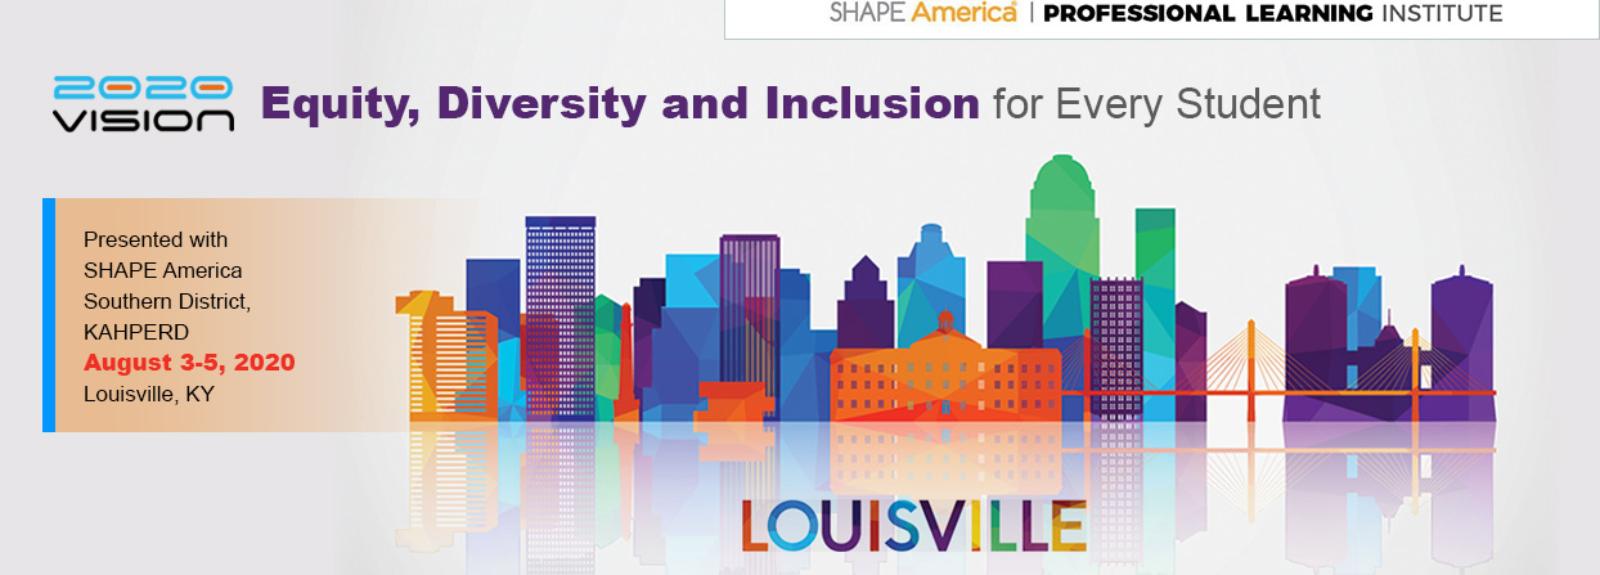 EDI-Louisville-image3